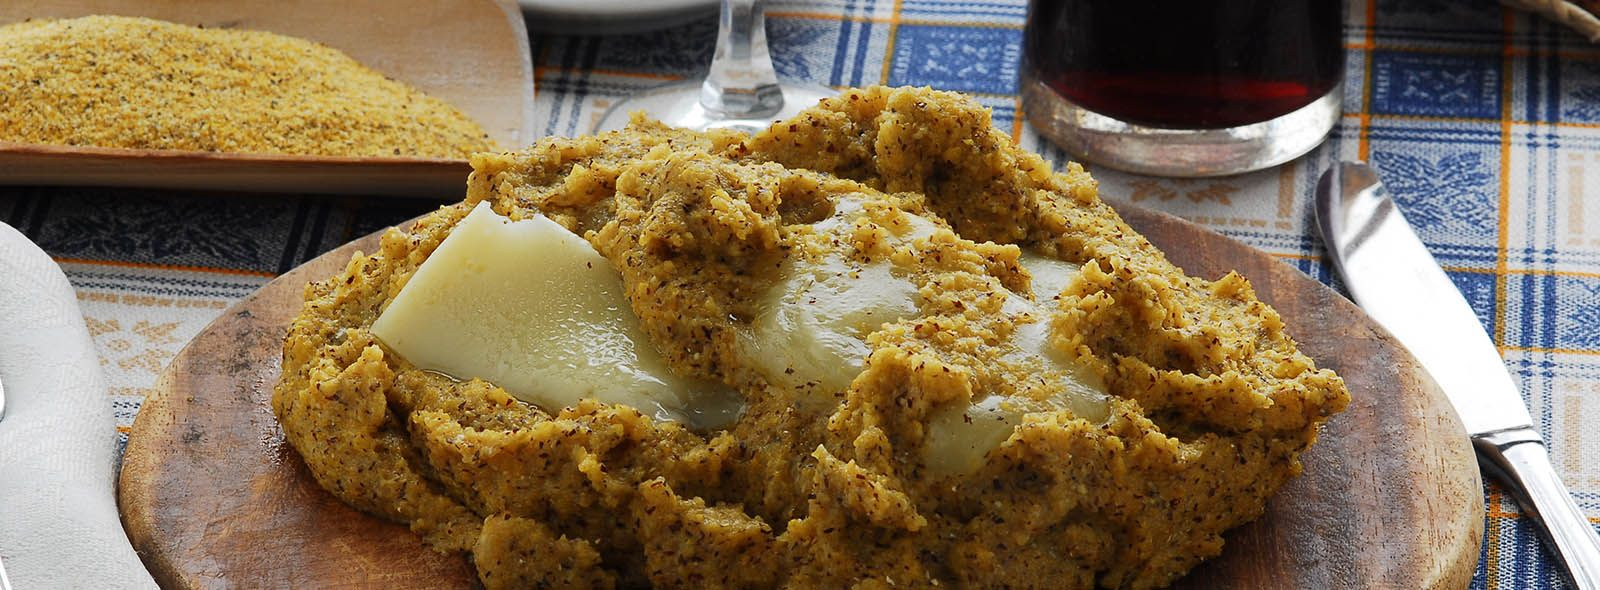 Dove mangiare polenta taragna a Bergamo